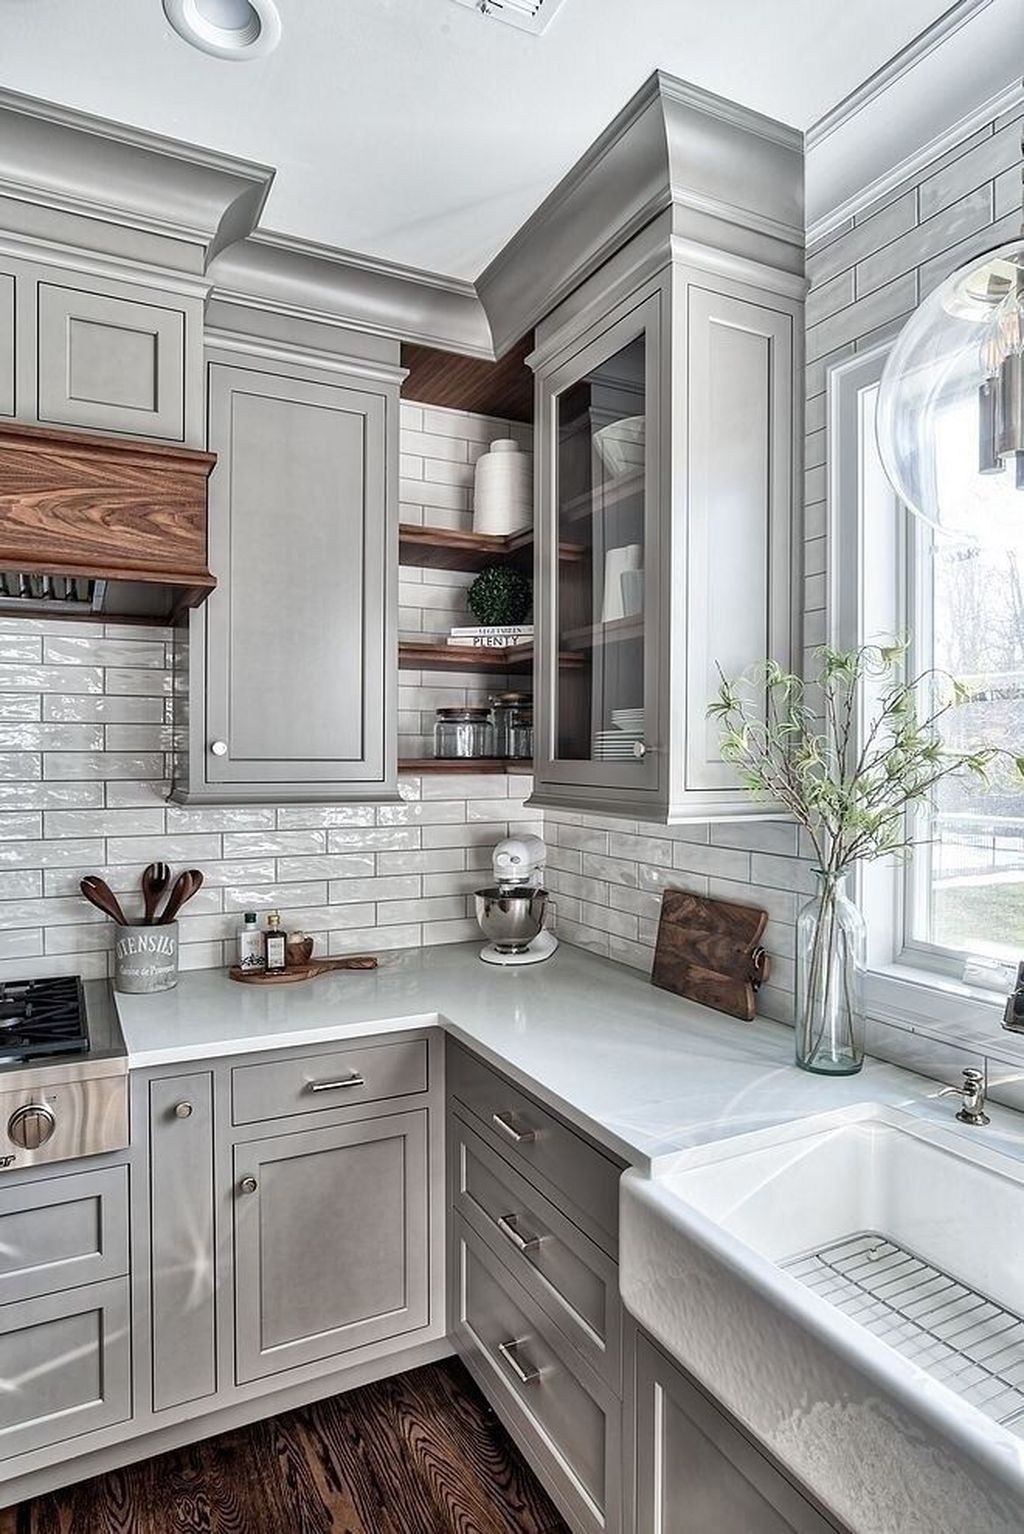 Small Kitchen Design 10x10: 49 + Creative Small Kitchen Design For Your Apartment